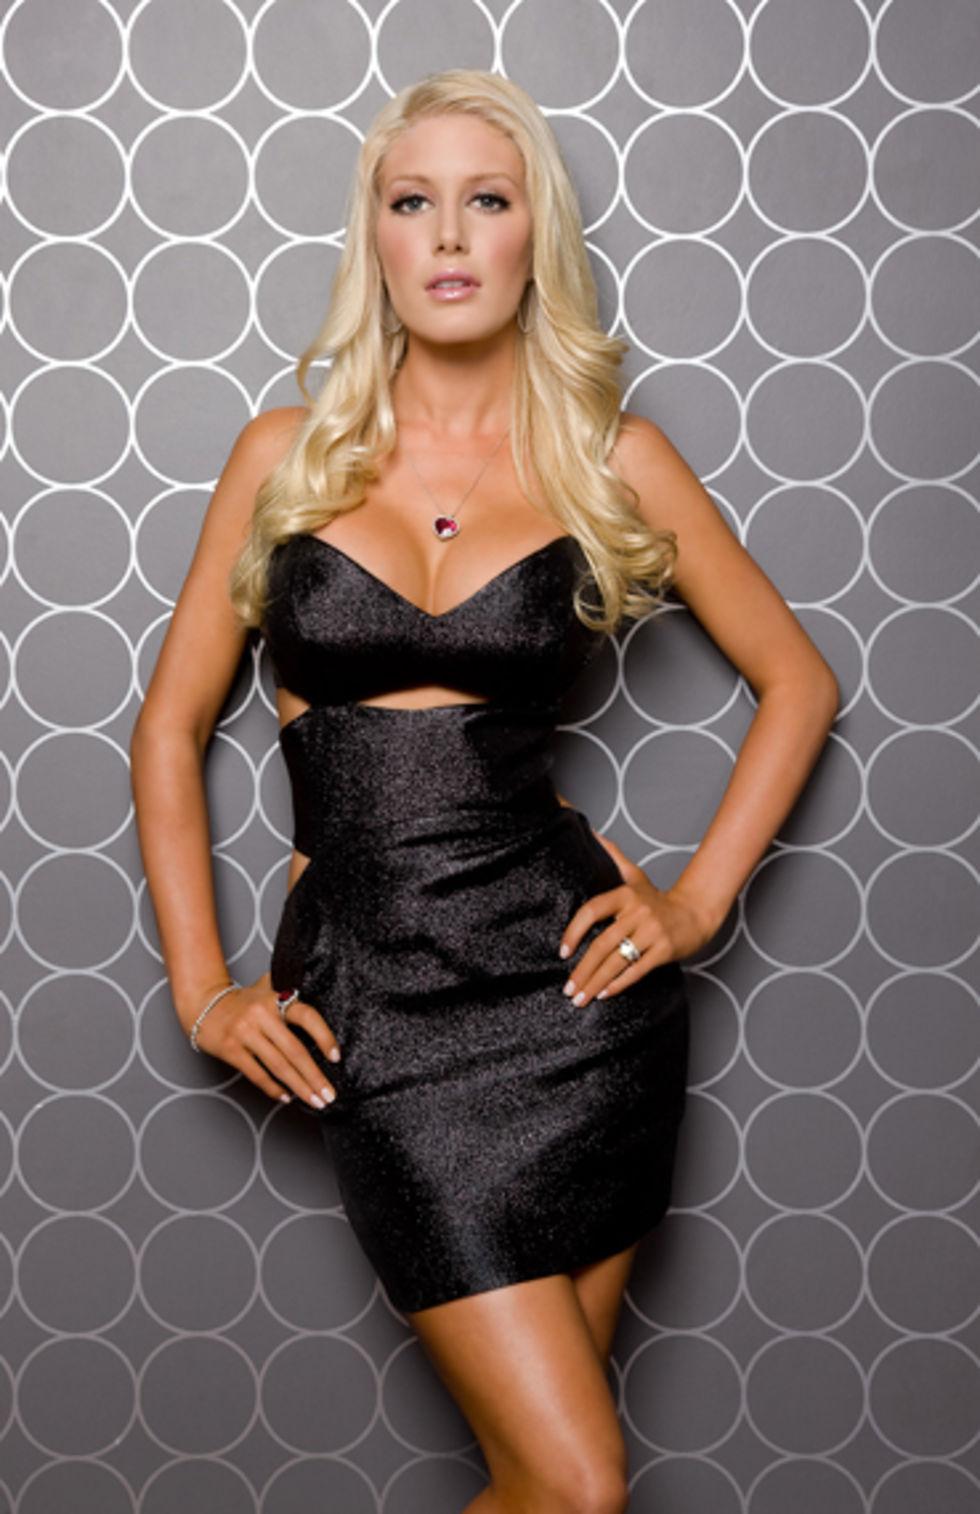 Heidi Montag Cleavy In The Hills Promo Pics Season 6 16